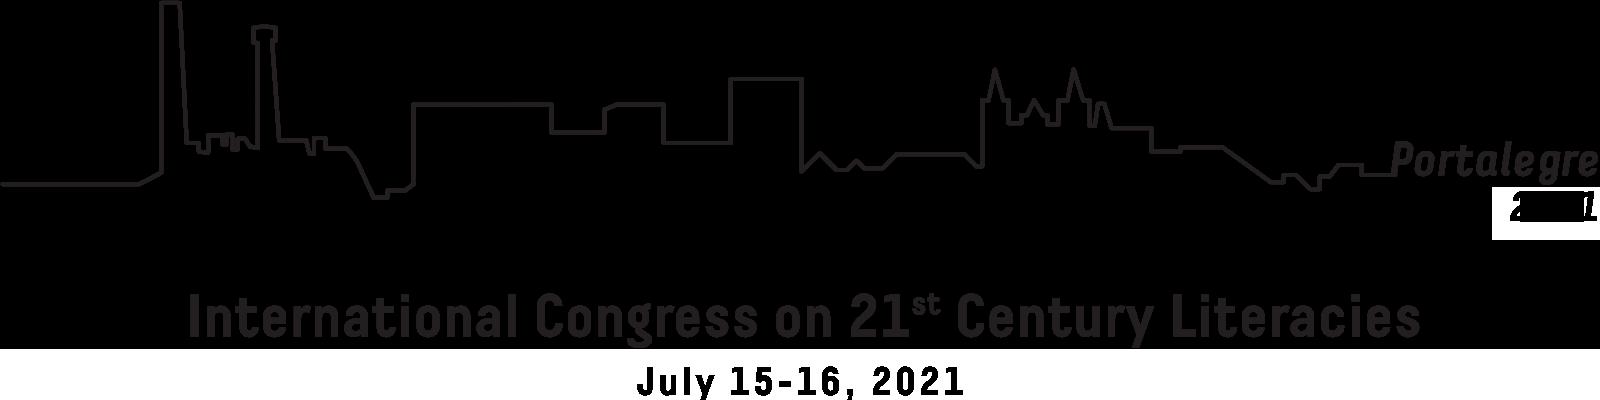 International Congress on 21st Century Literacies